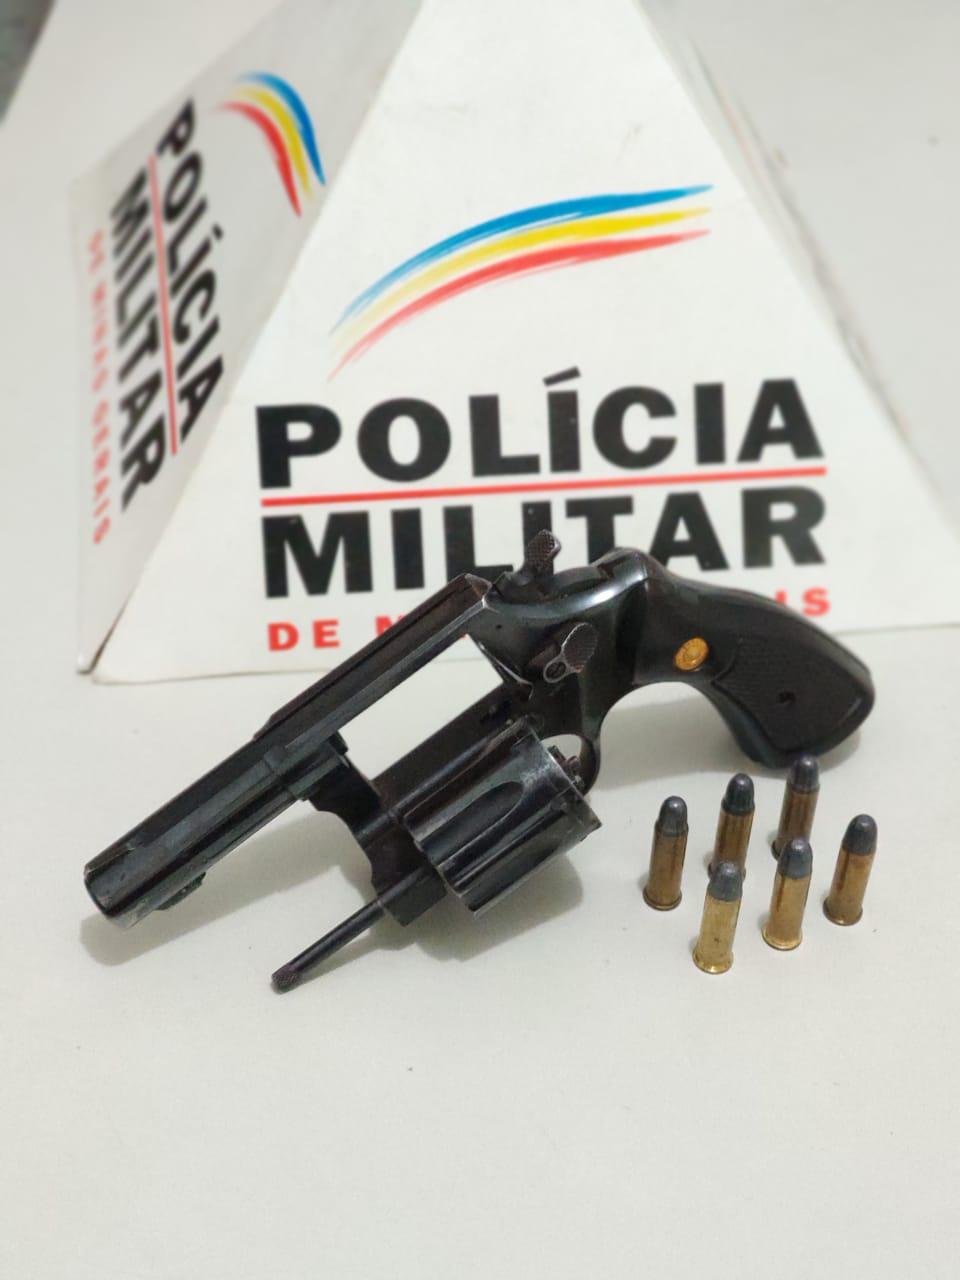 POLÍCIA PRENDE CONDUTOR ARMADO COM REVOLVER NA BR-259